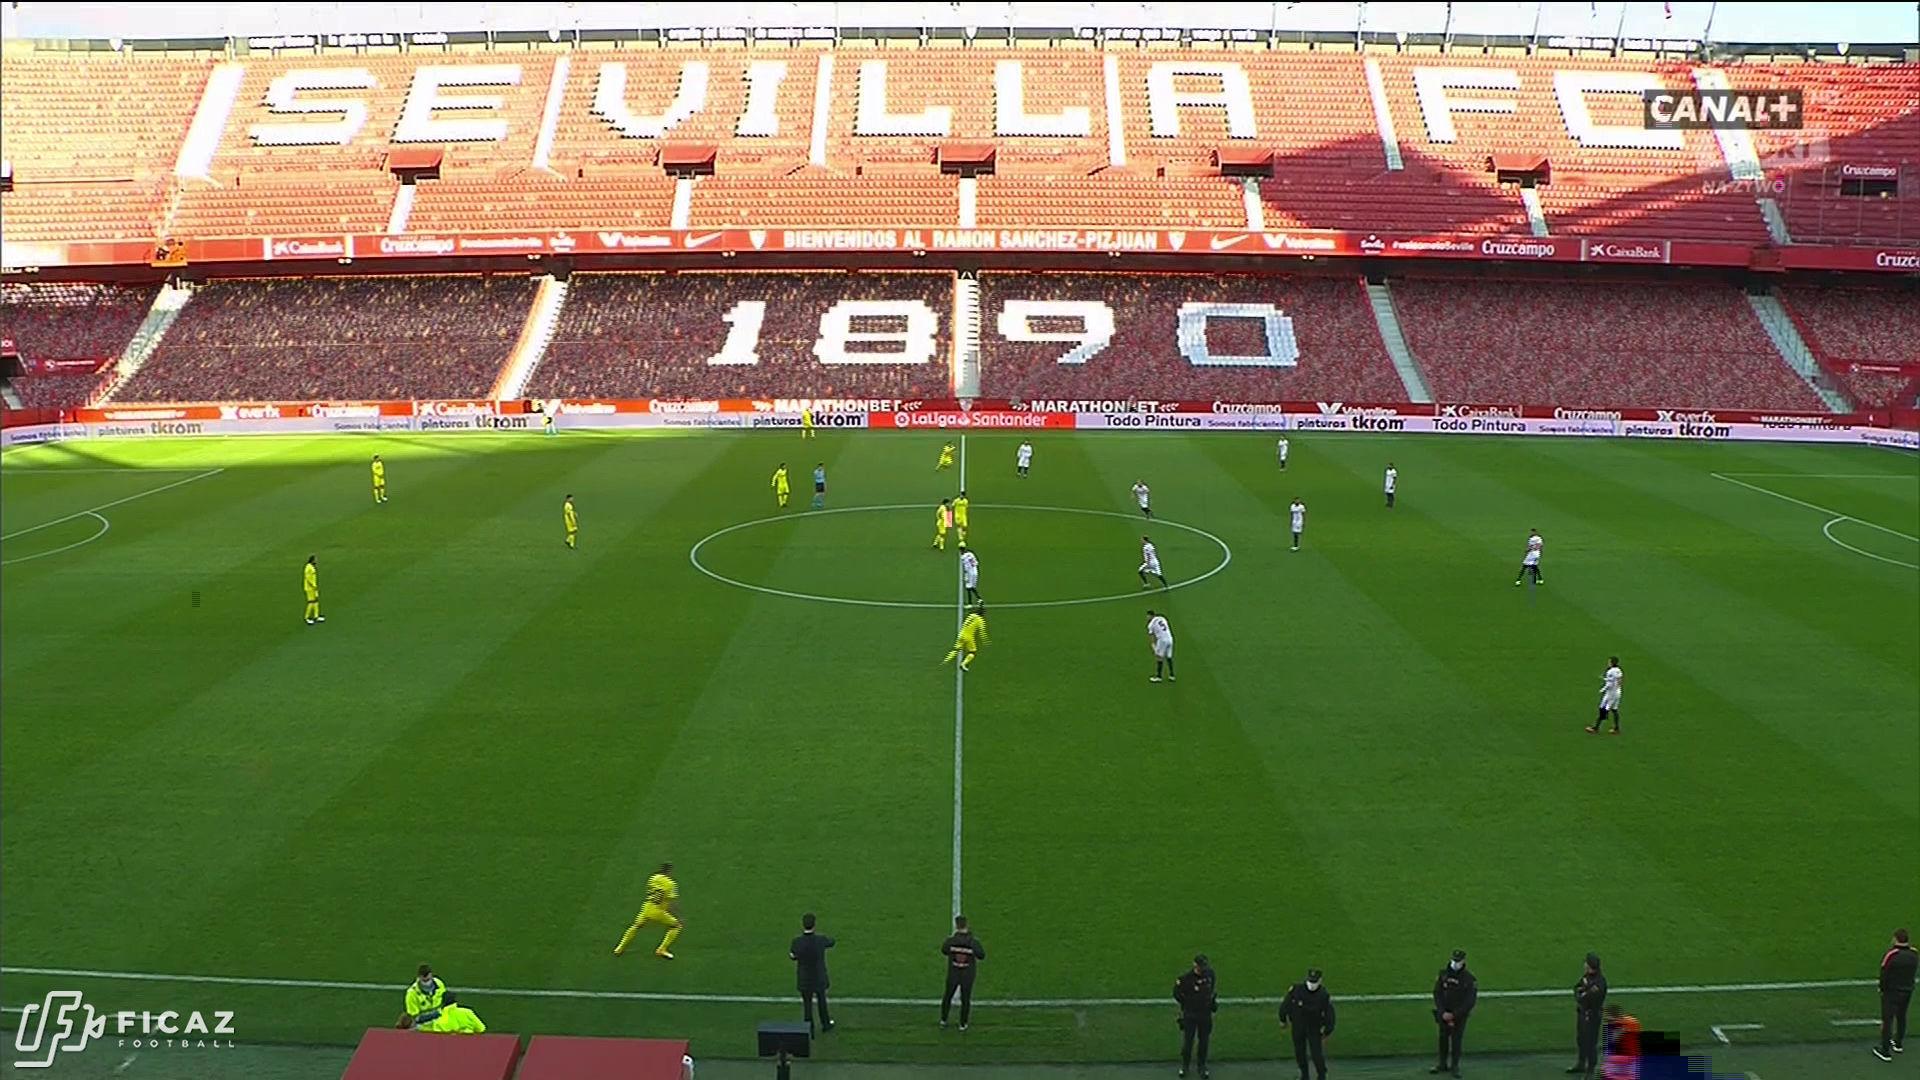 Sevilla FC - Main